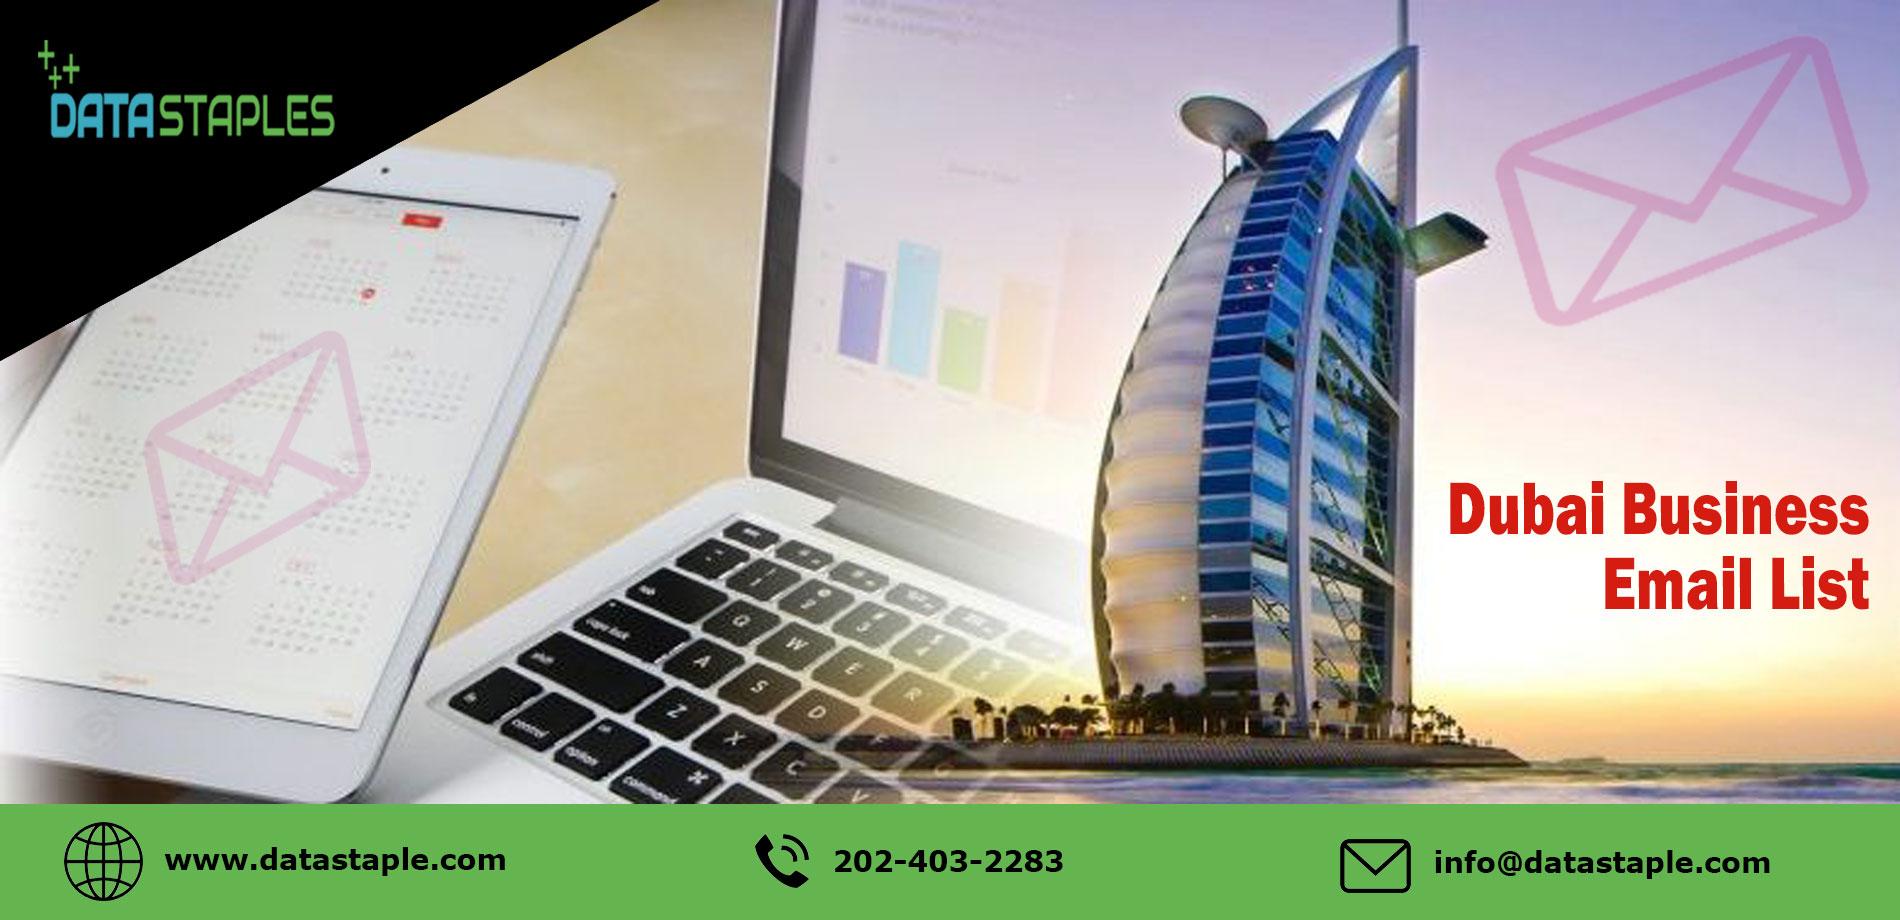 Dubai Business Email List   DataStaples